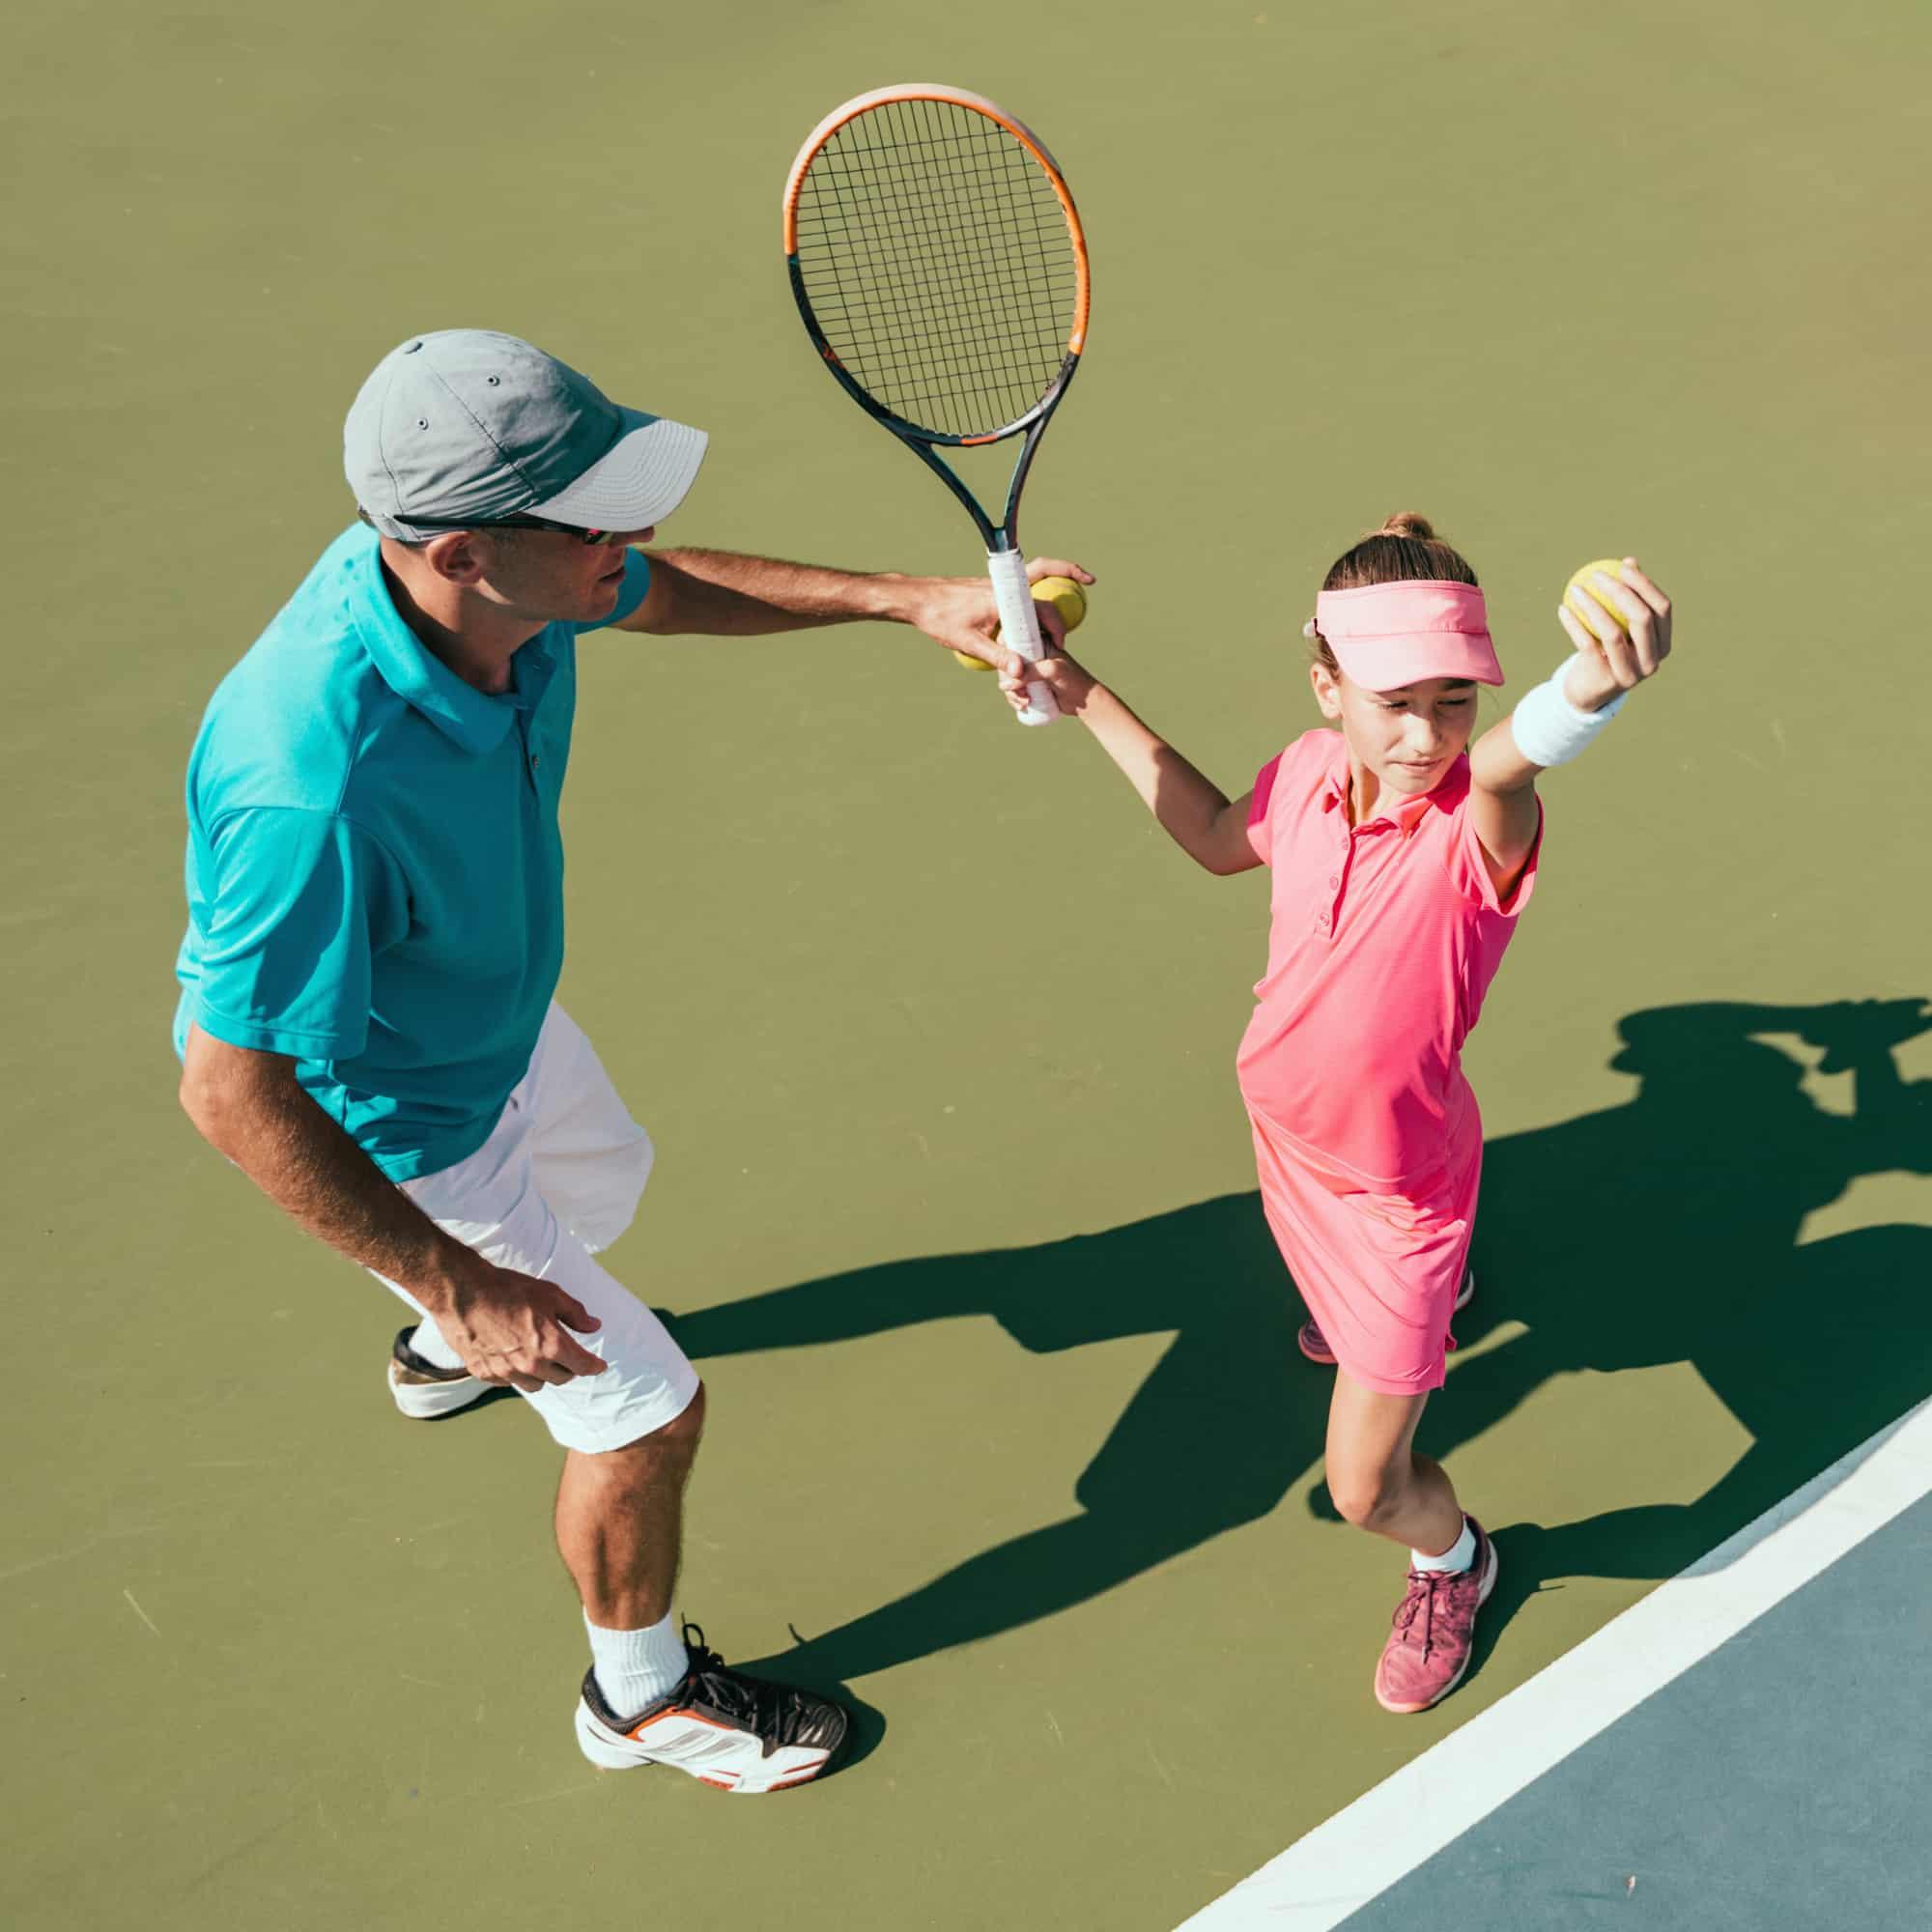 HOW TO START A TENNIS ACADEMY IN DUBAI